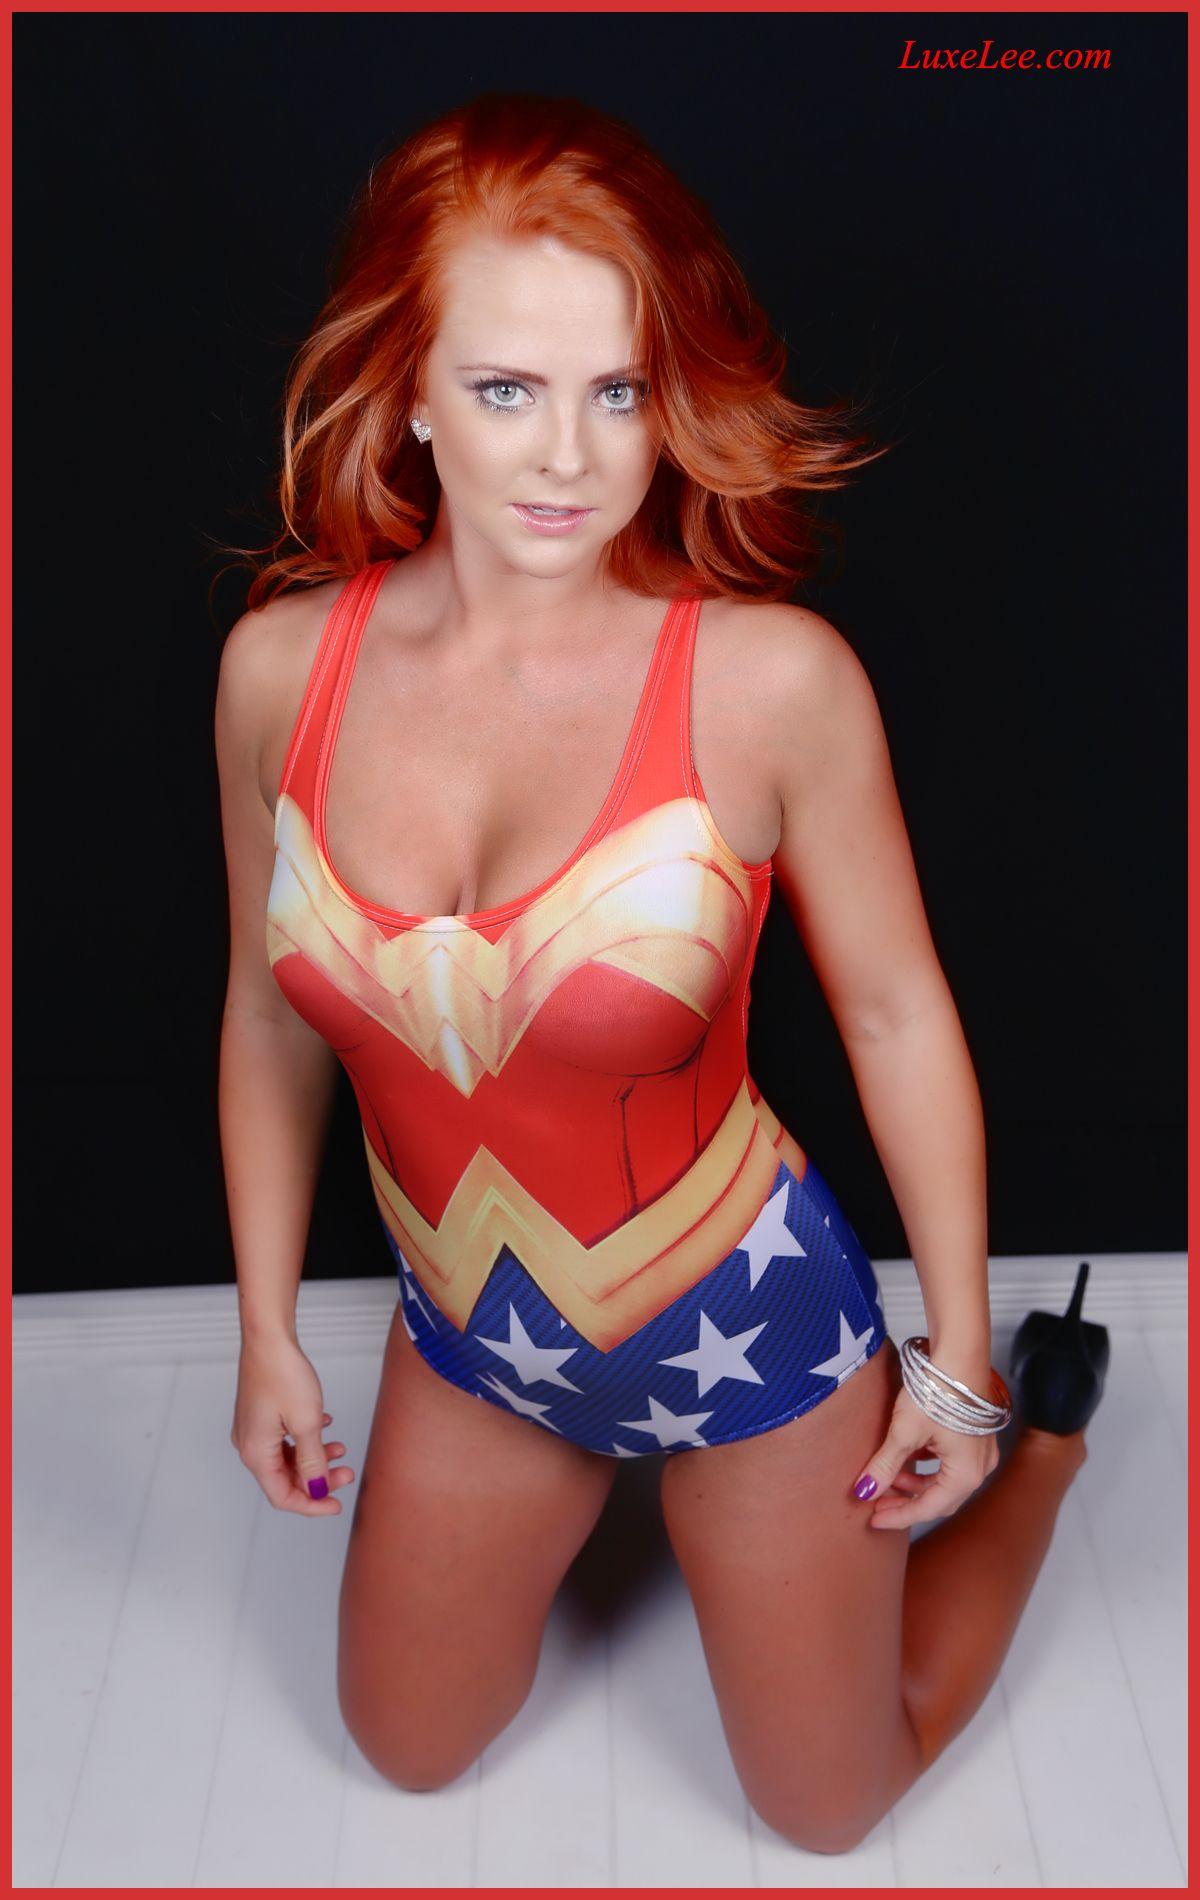 Wonder Woman Costume Lovely Redheads Pinterest Wonder Woman